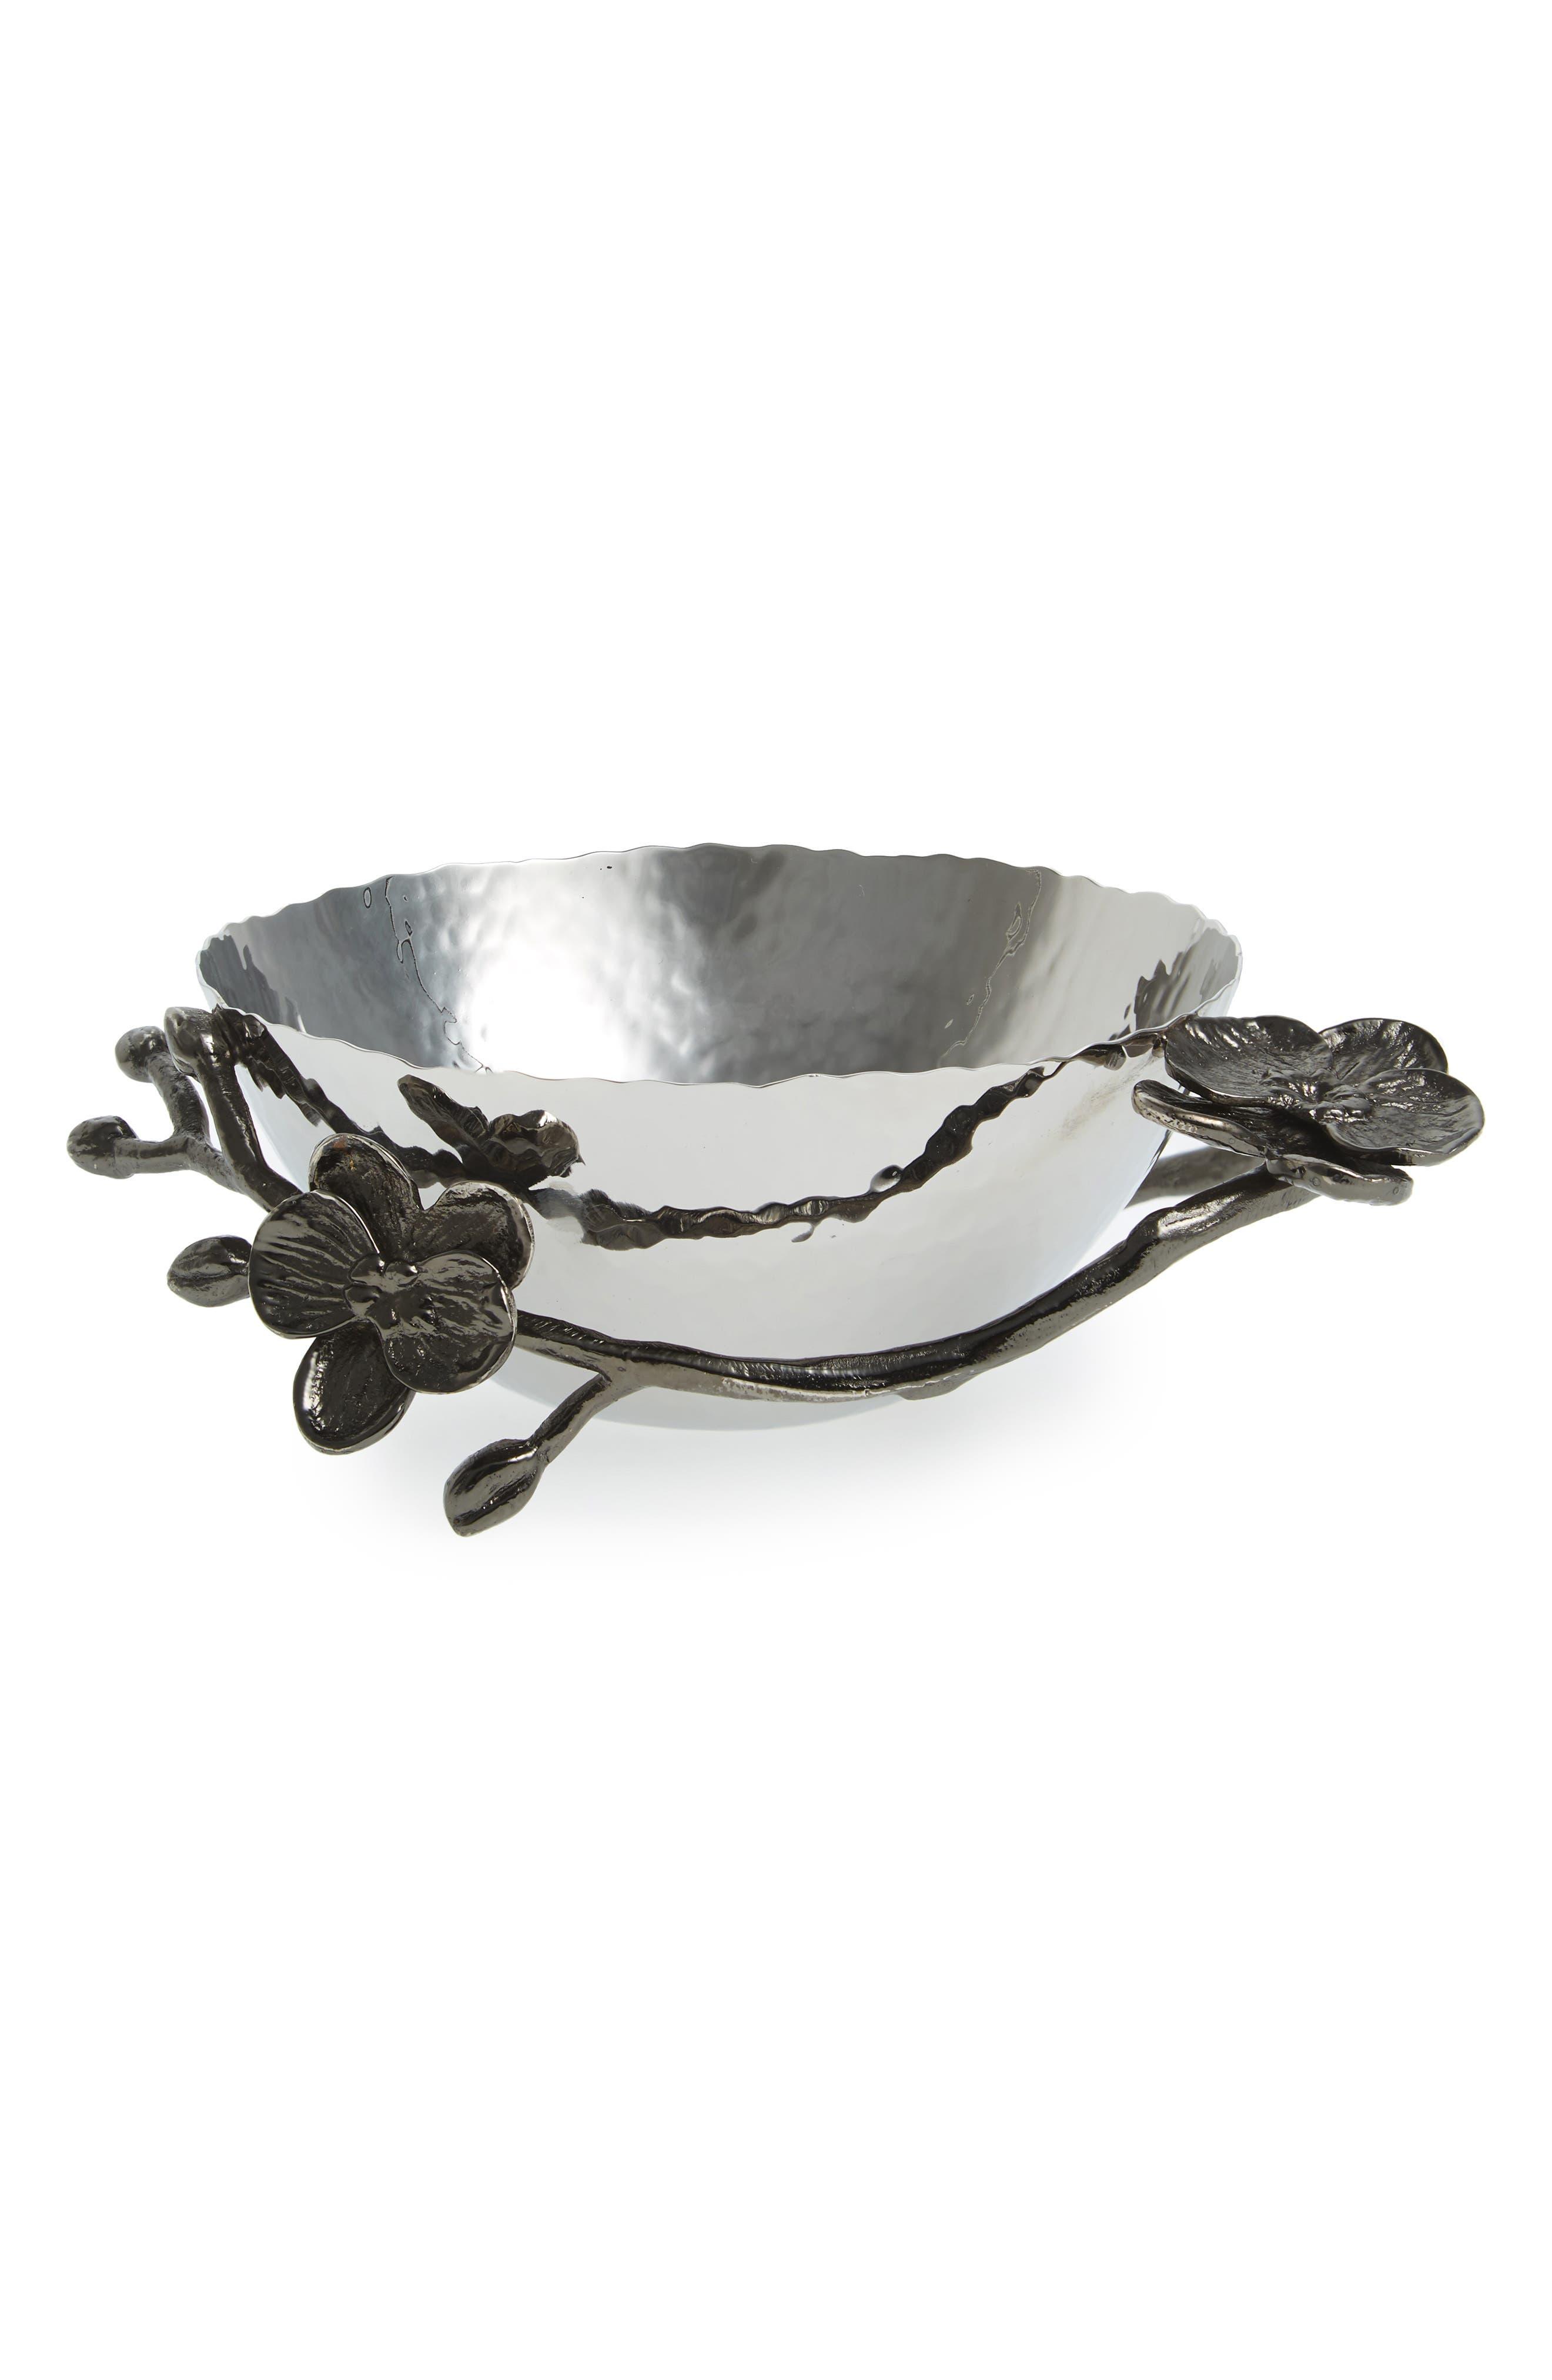 MICHAEL ARAM,                             'Black Orchid' Nut Bowl,                             Main thumbnail 1, color,                             Black Nickel